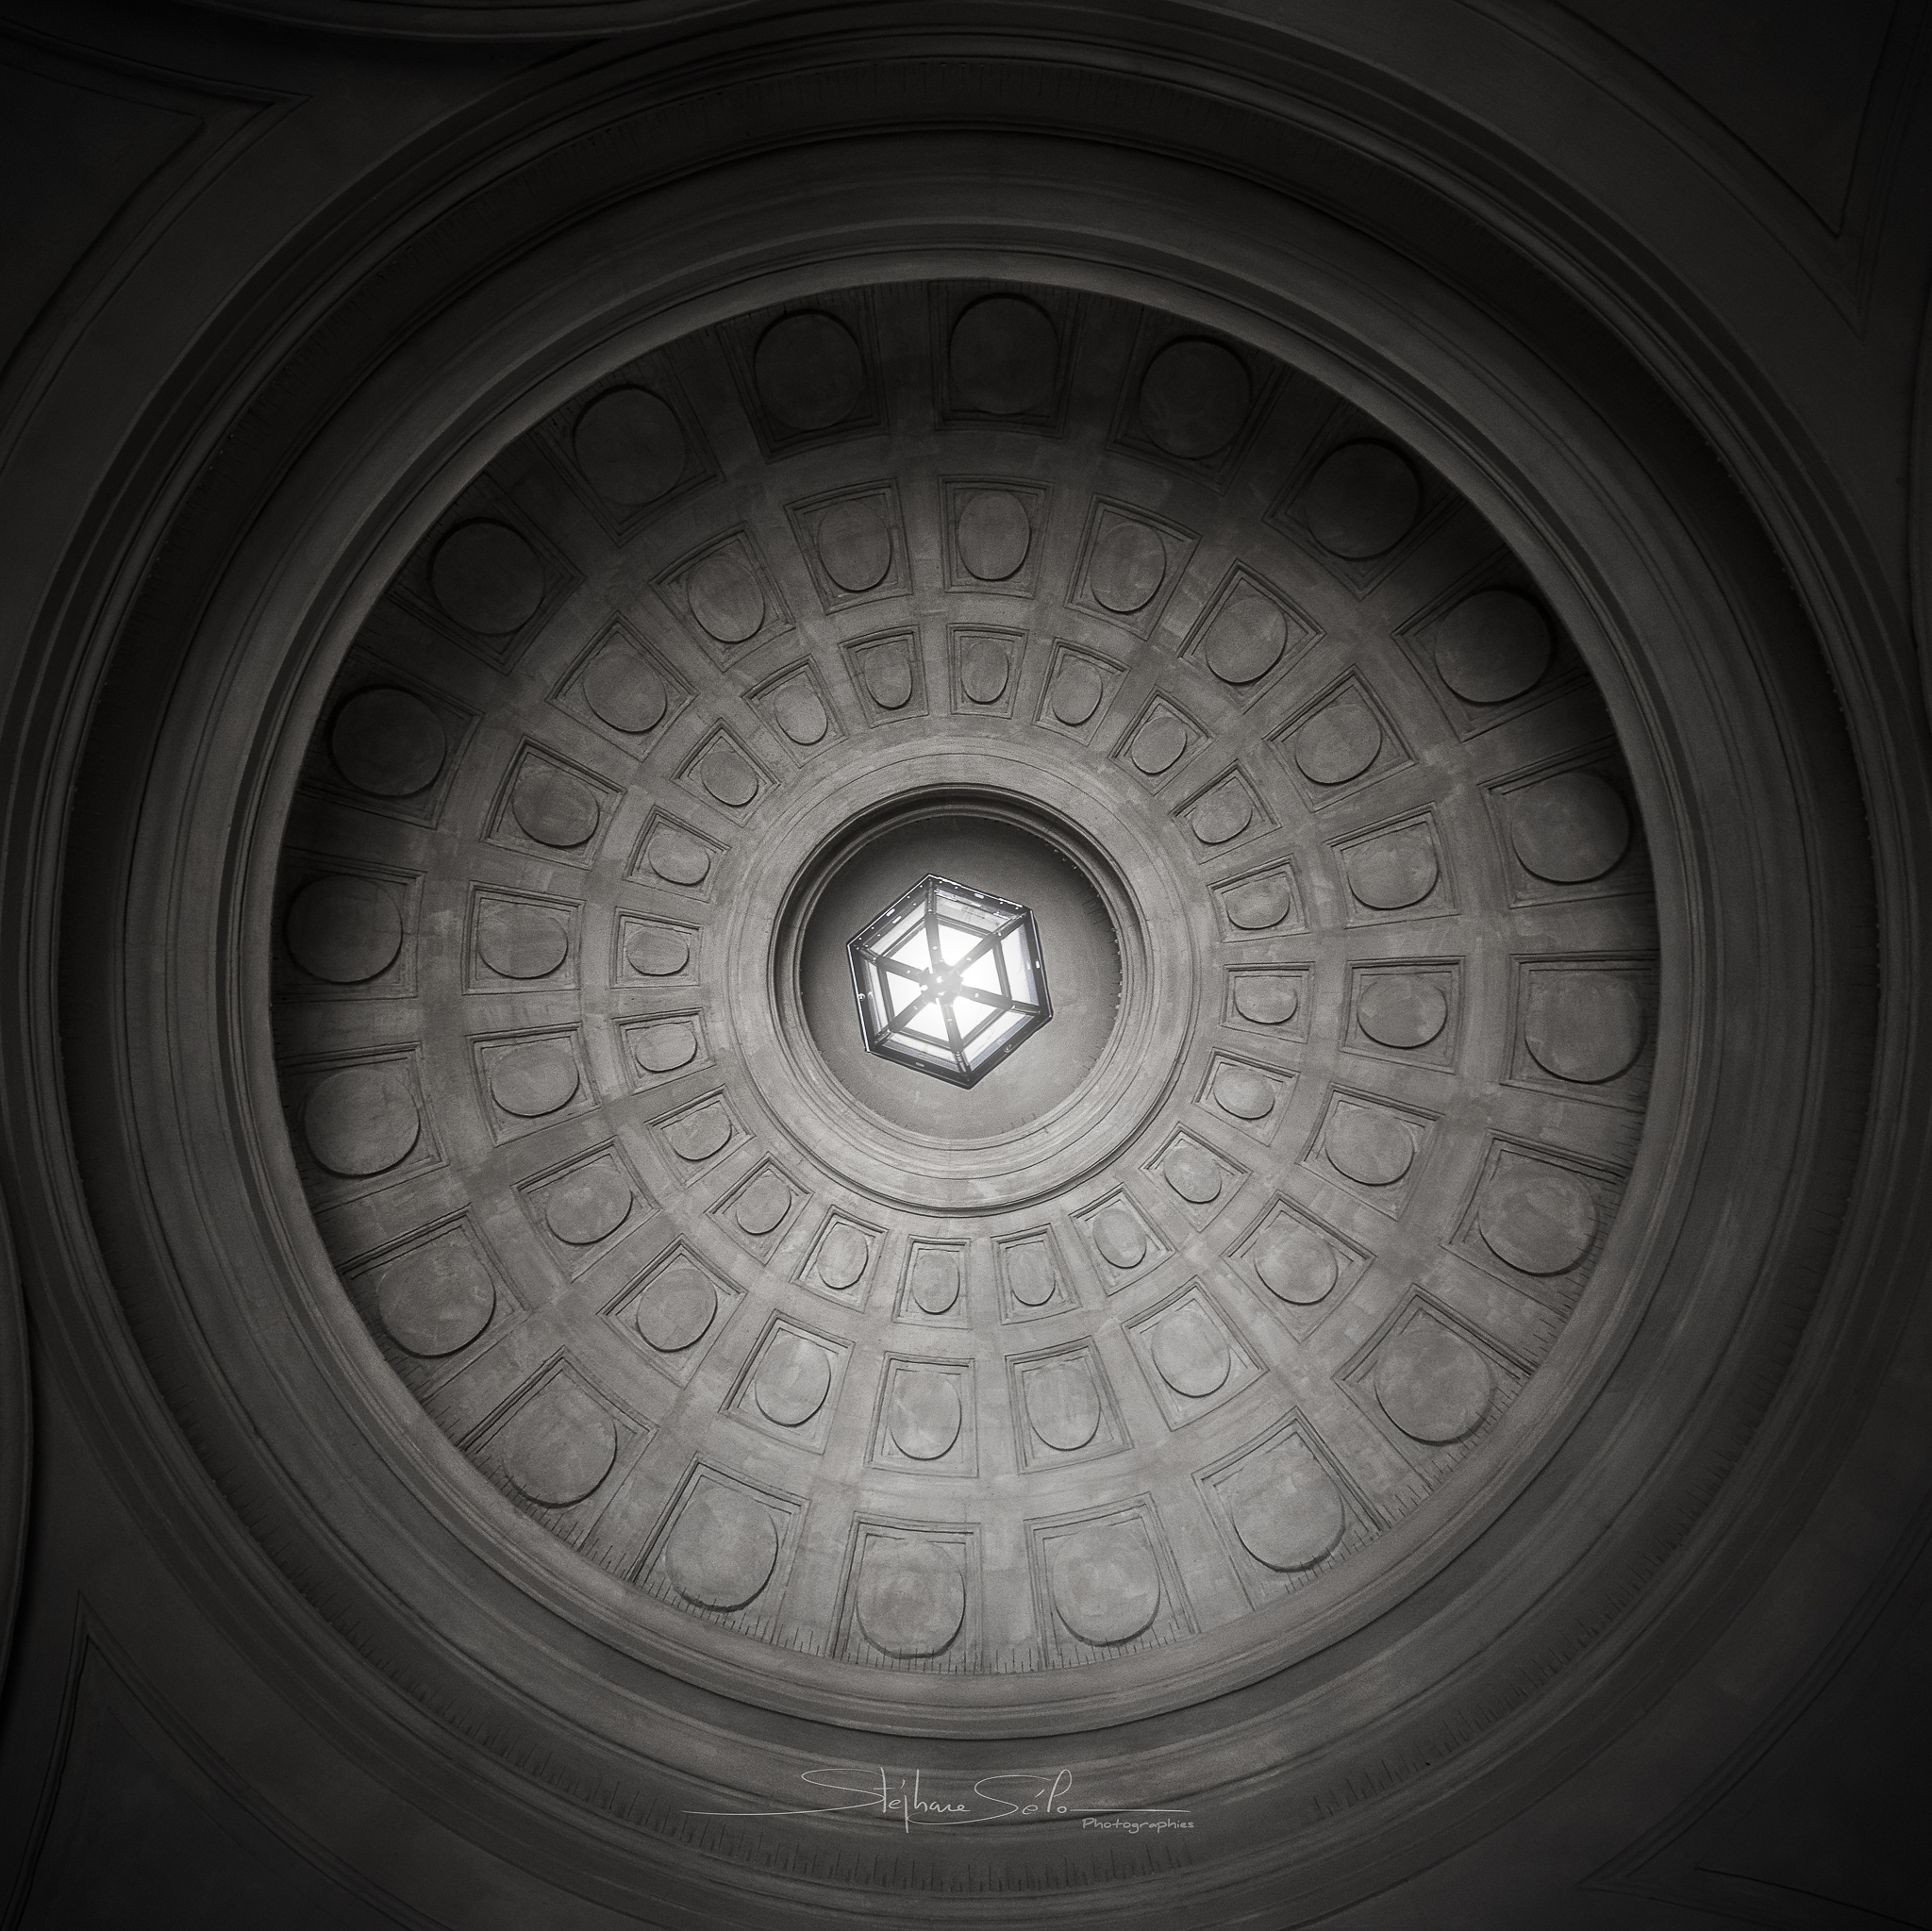 Grand Hôtel-Dieu